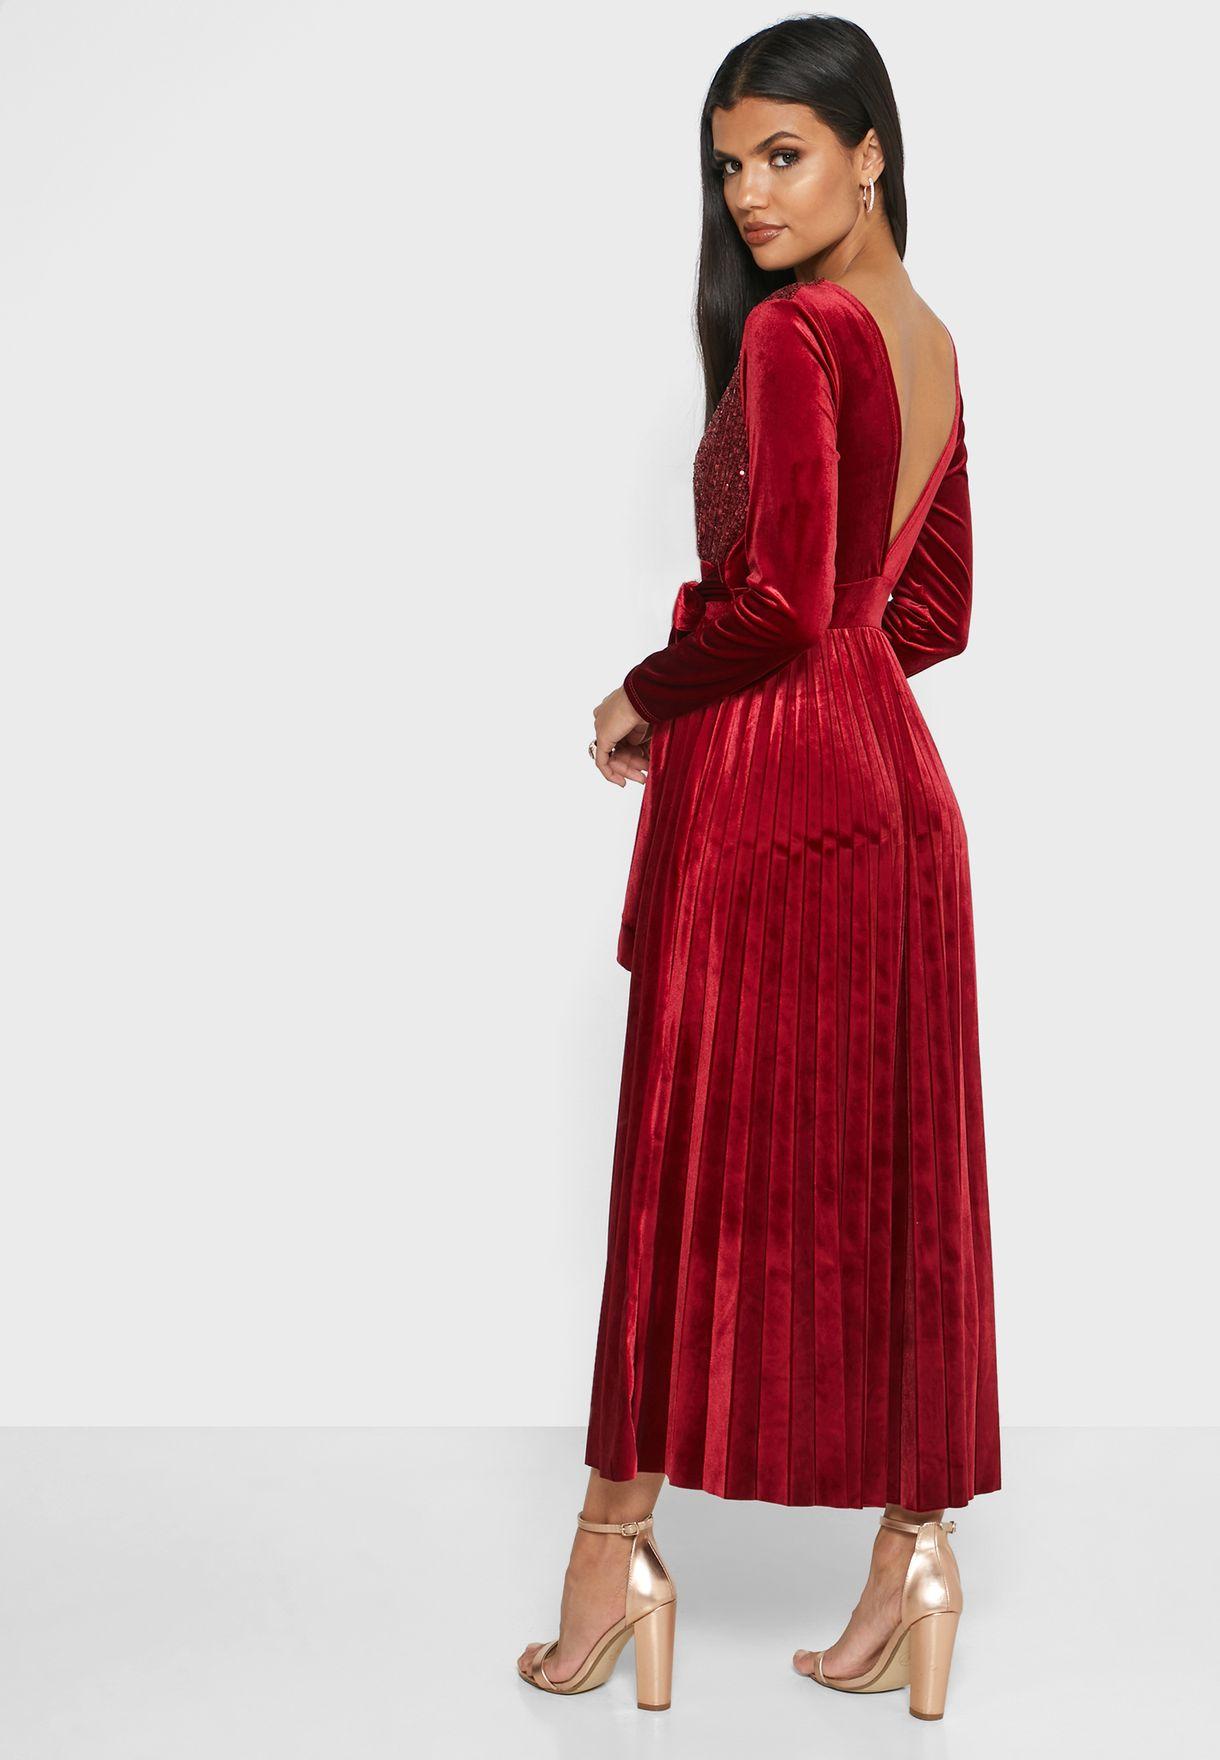 فستان مخملي ماكسي لف مزين بترتر